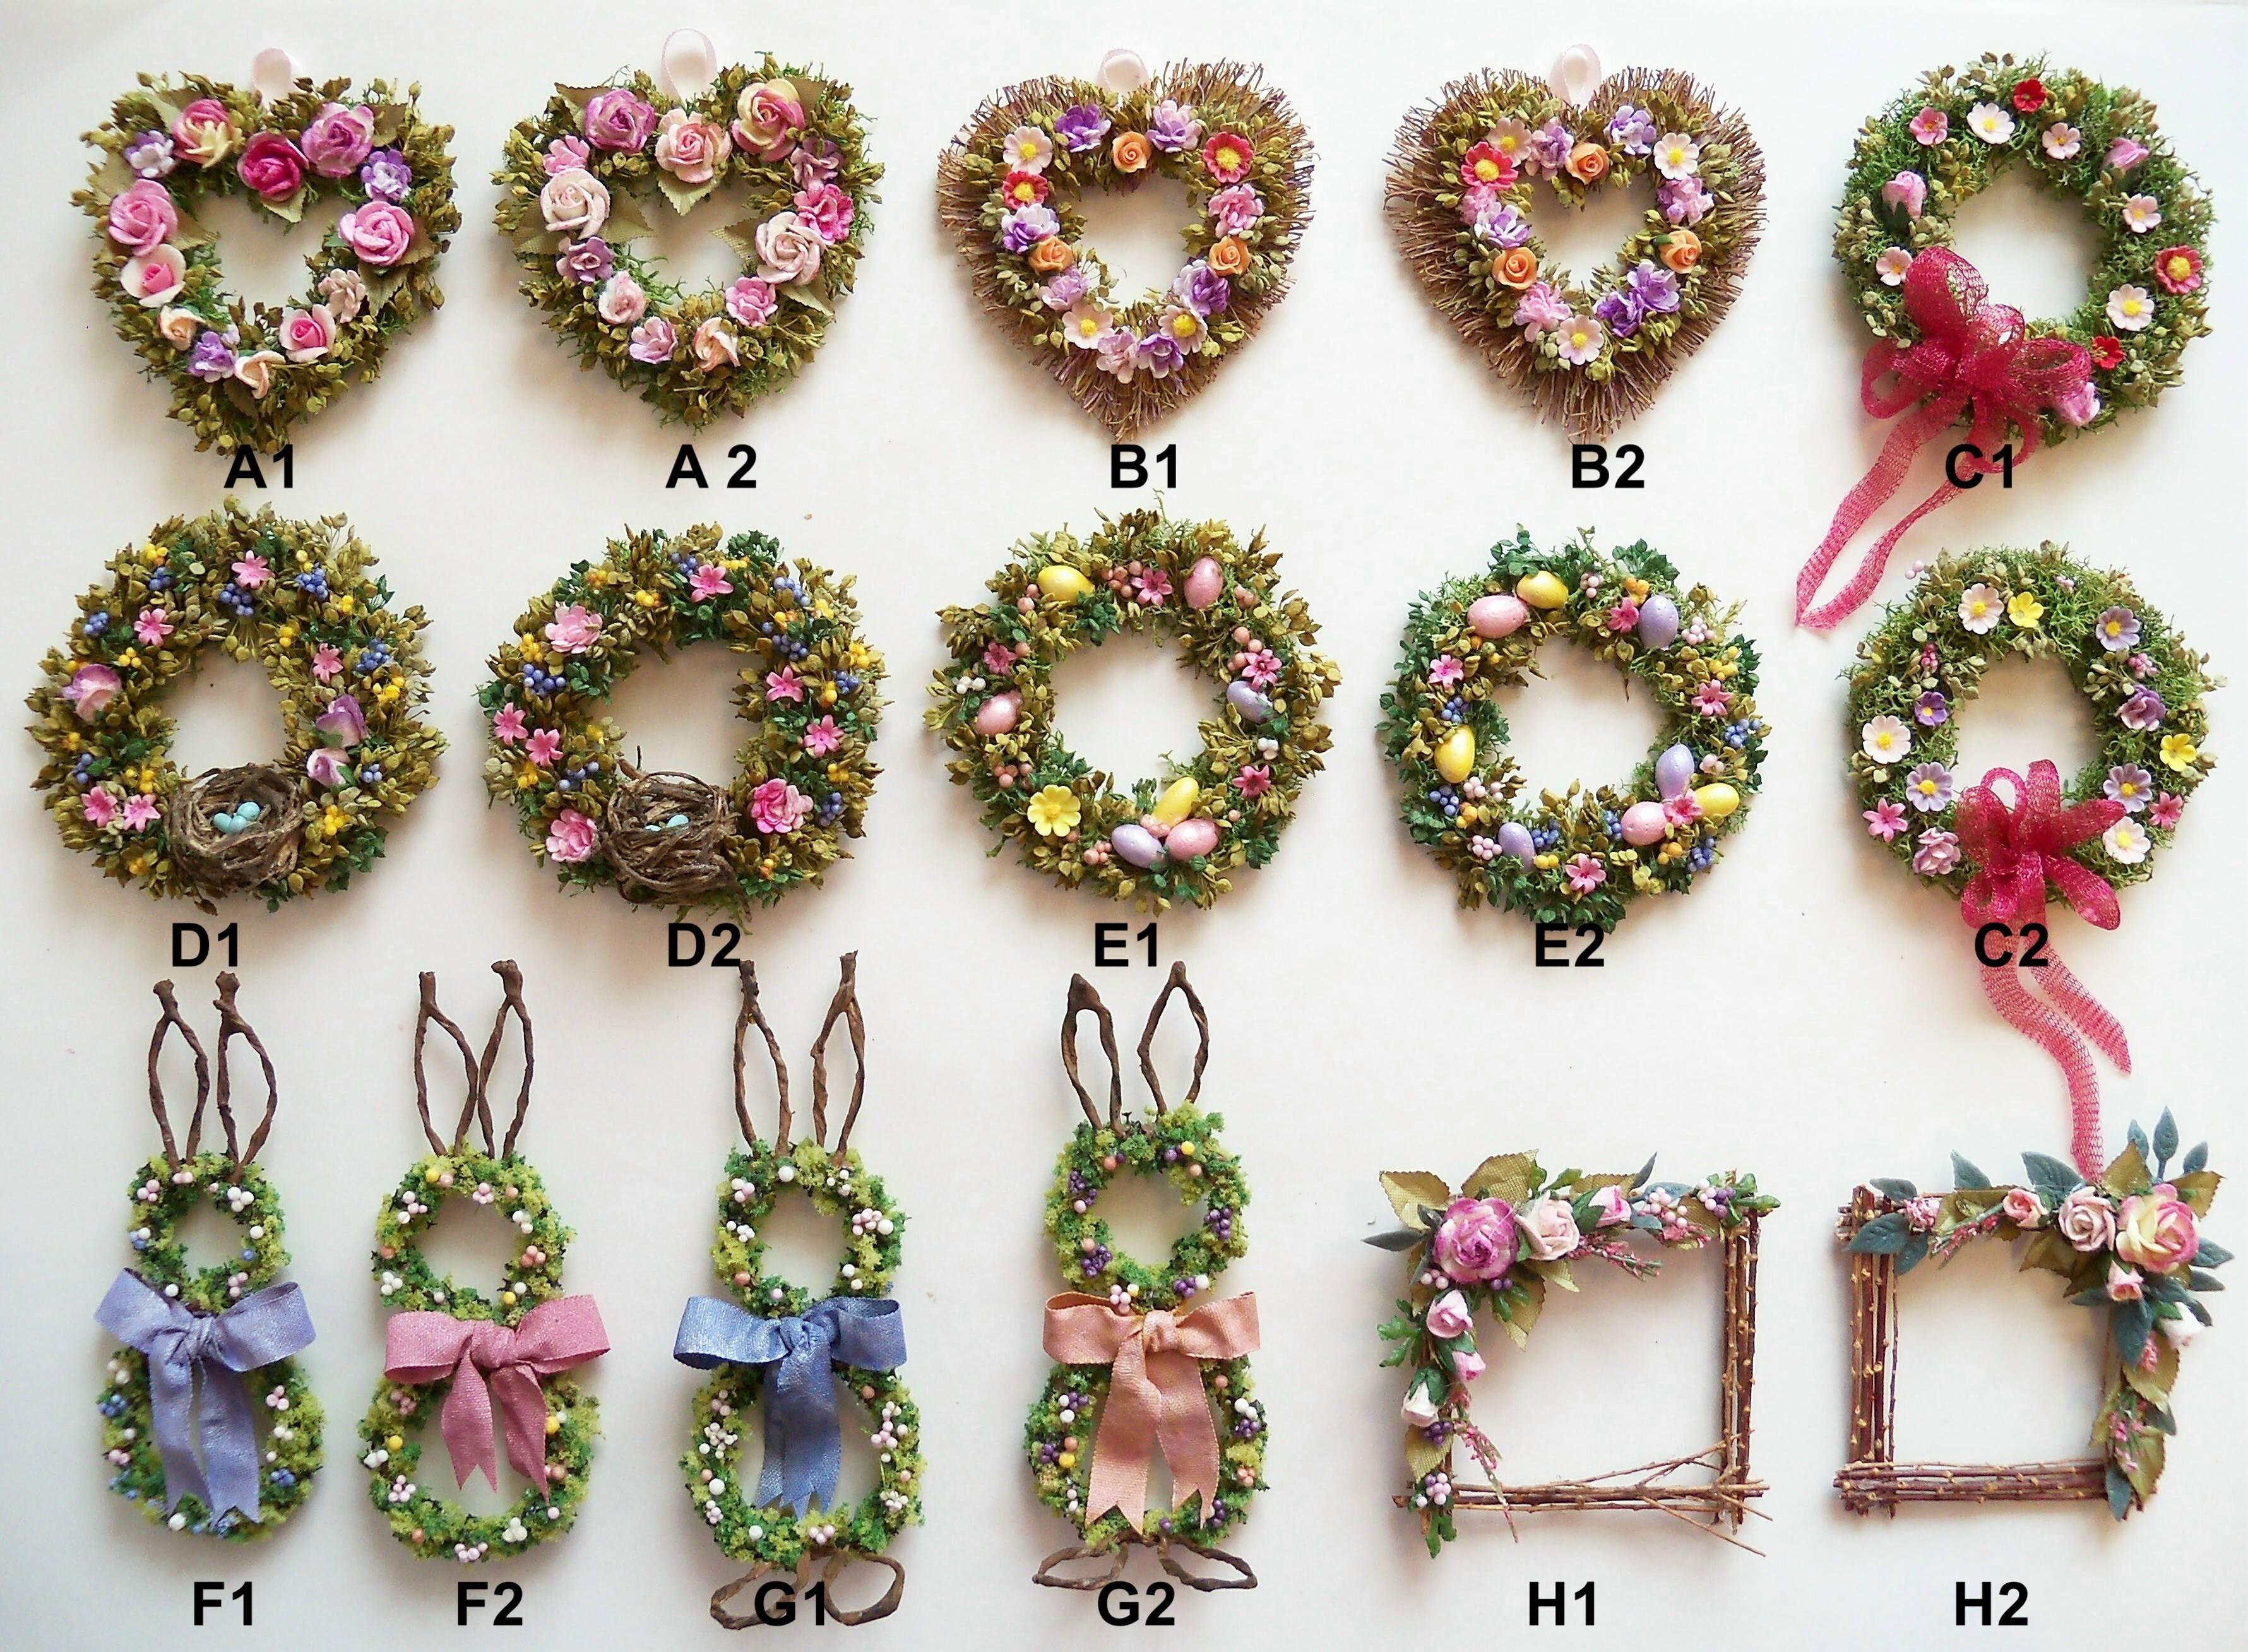 Wreath assortment